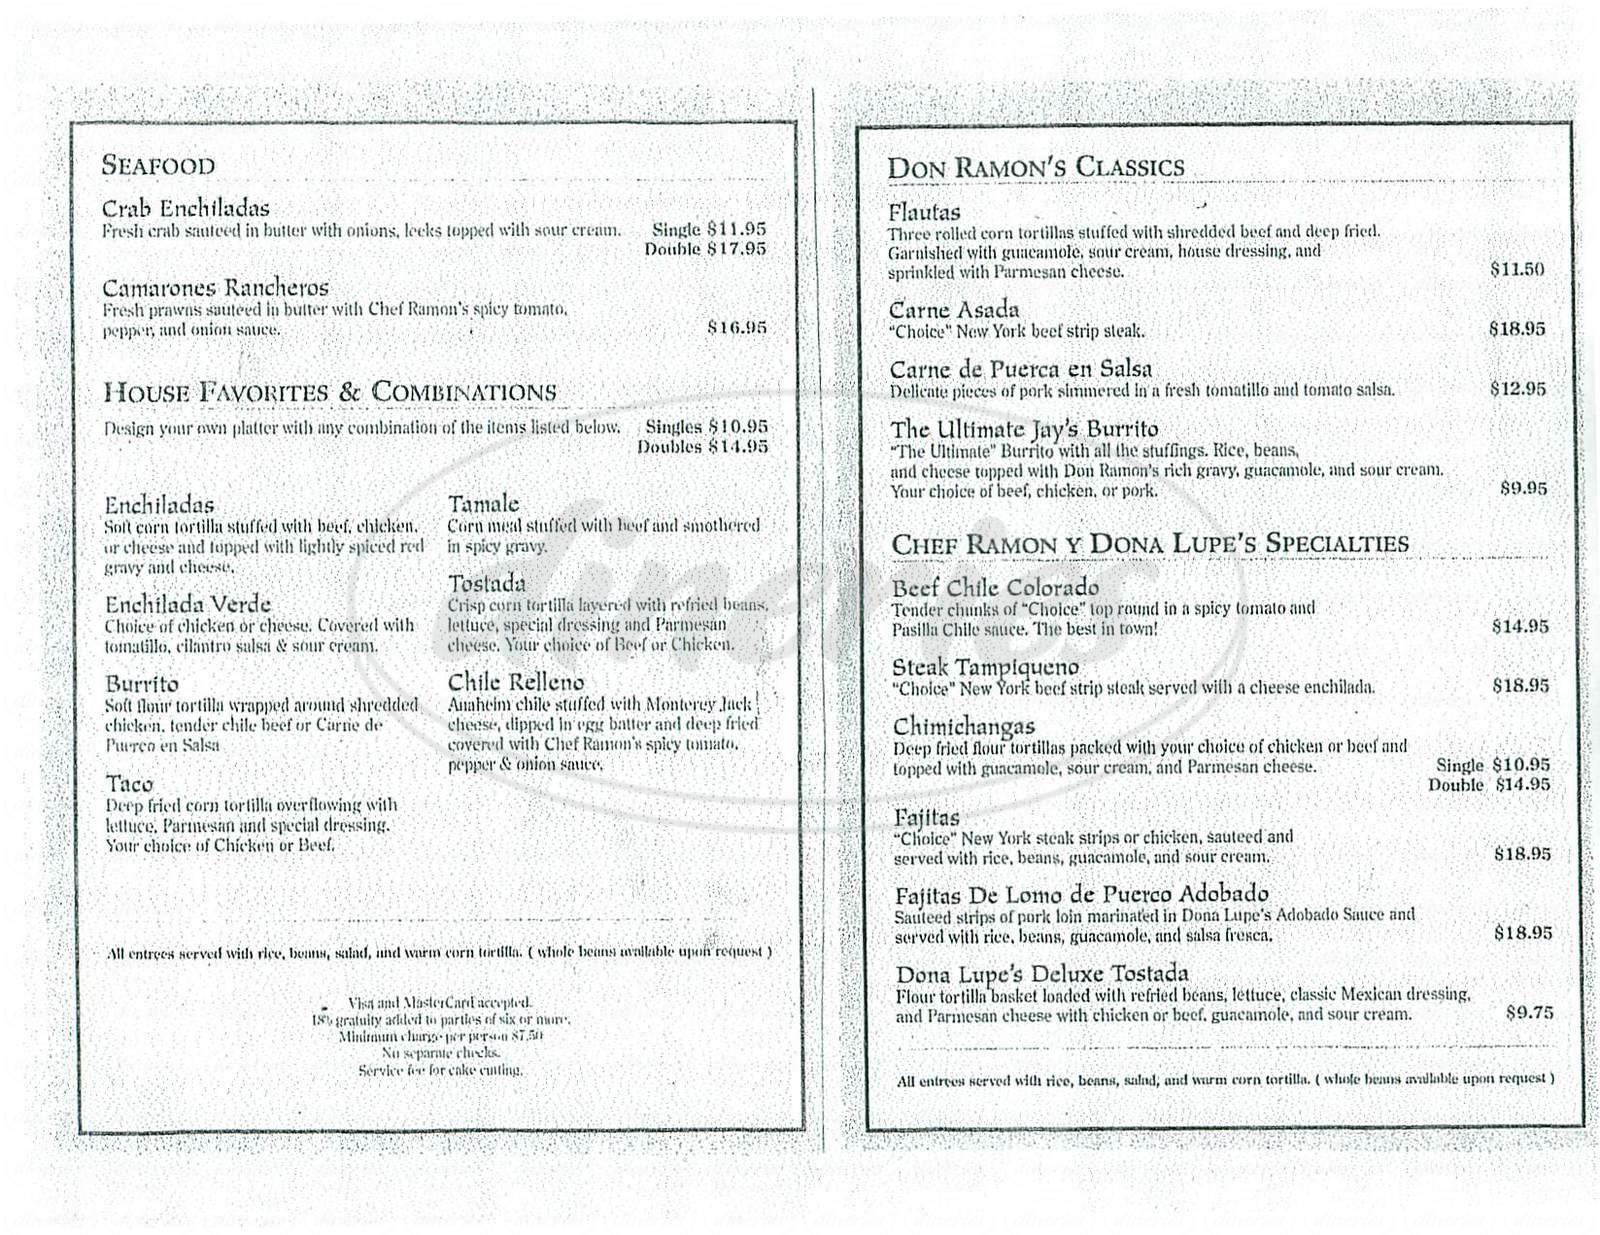 menu for Don Ramon's